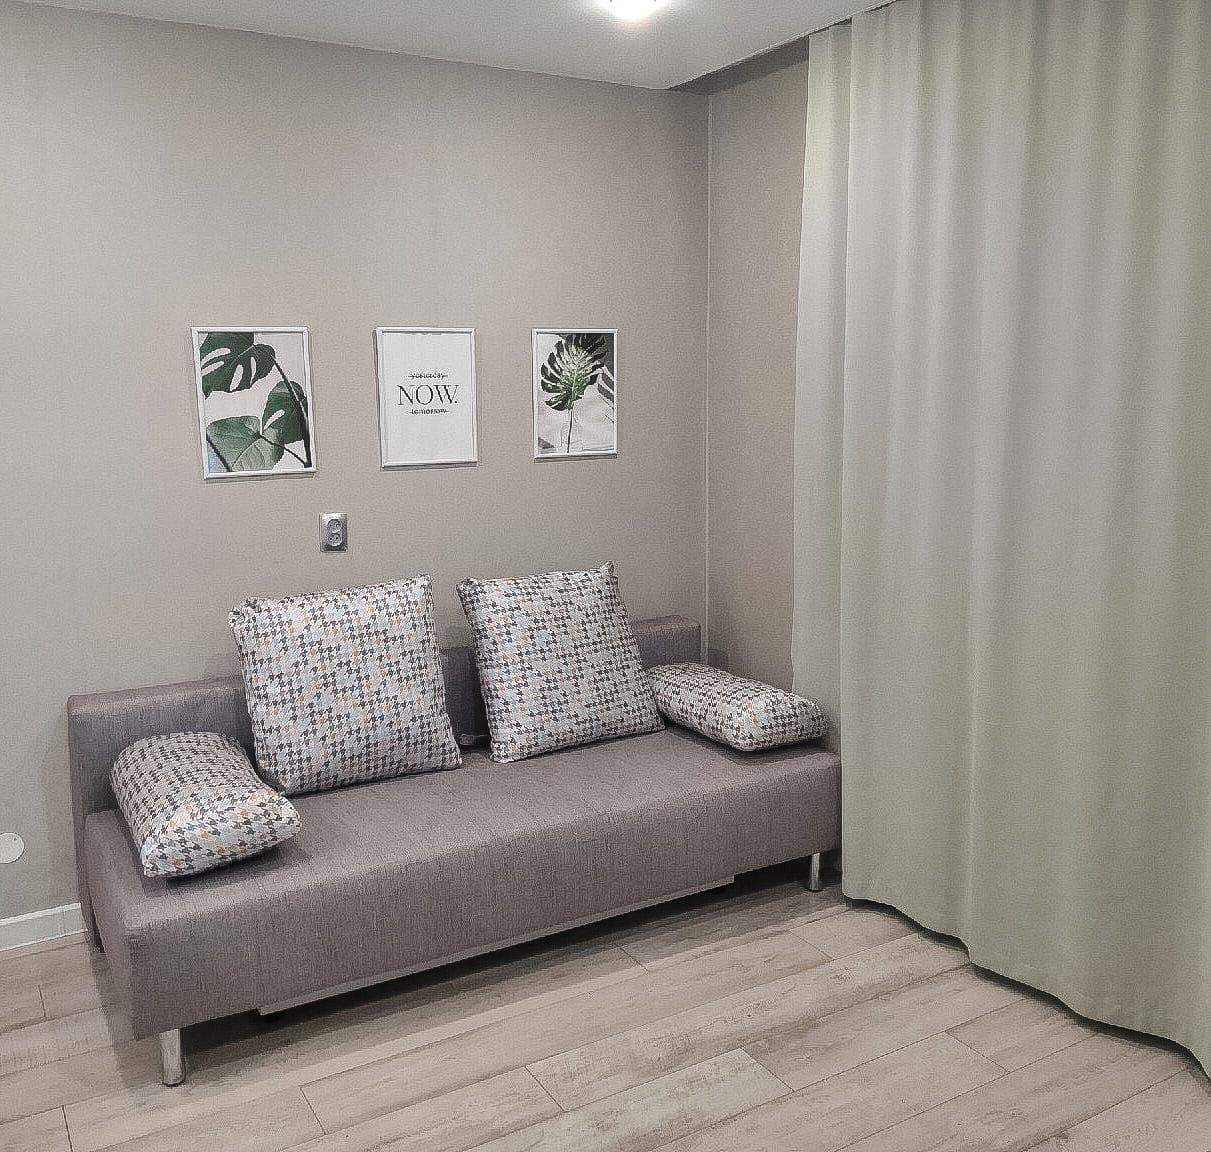 Дизайн квартиры-студии, 24,6 кВ м.